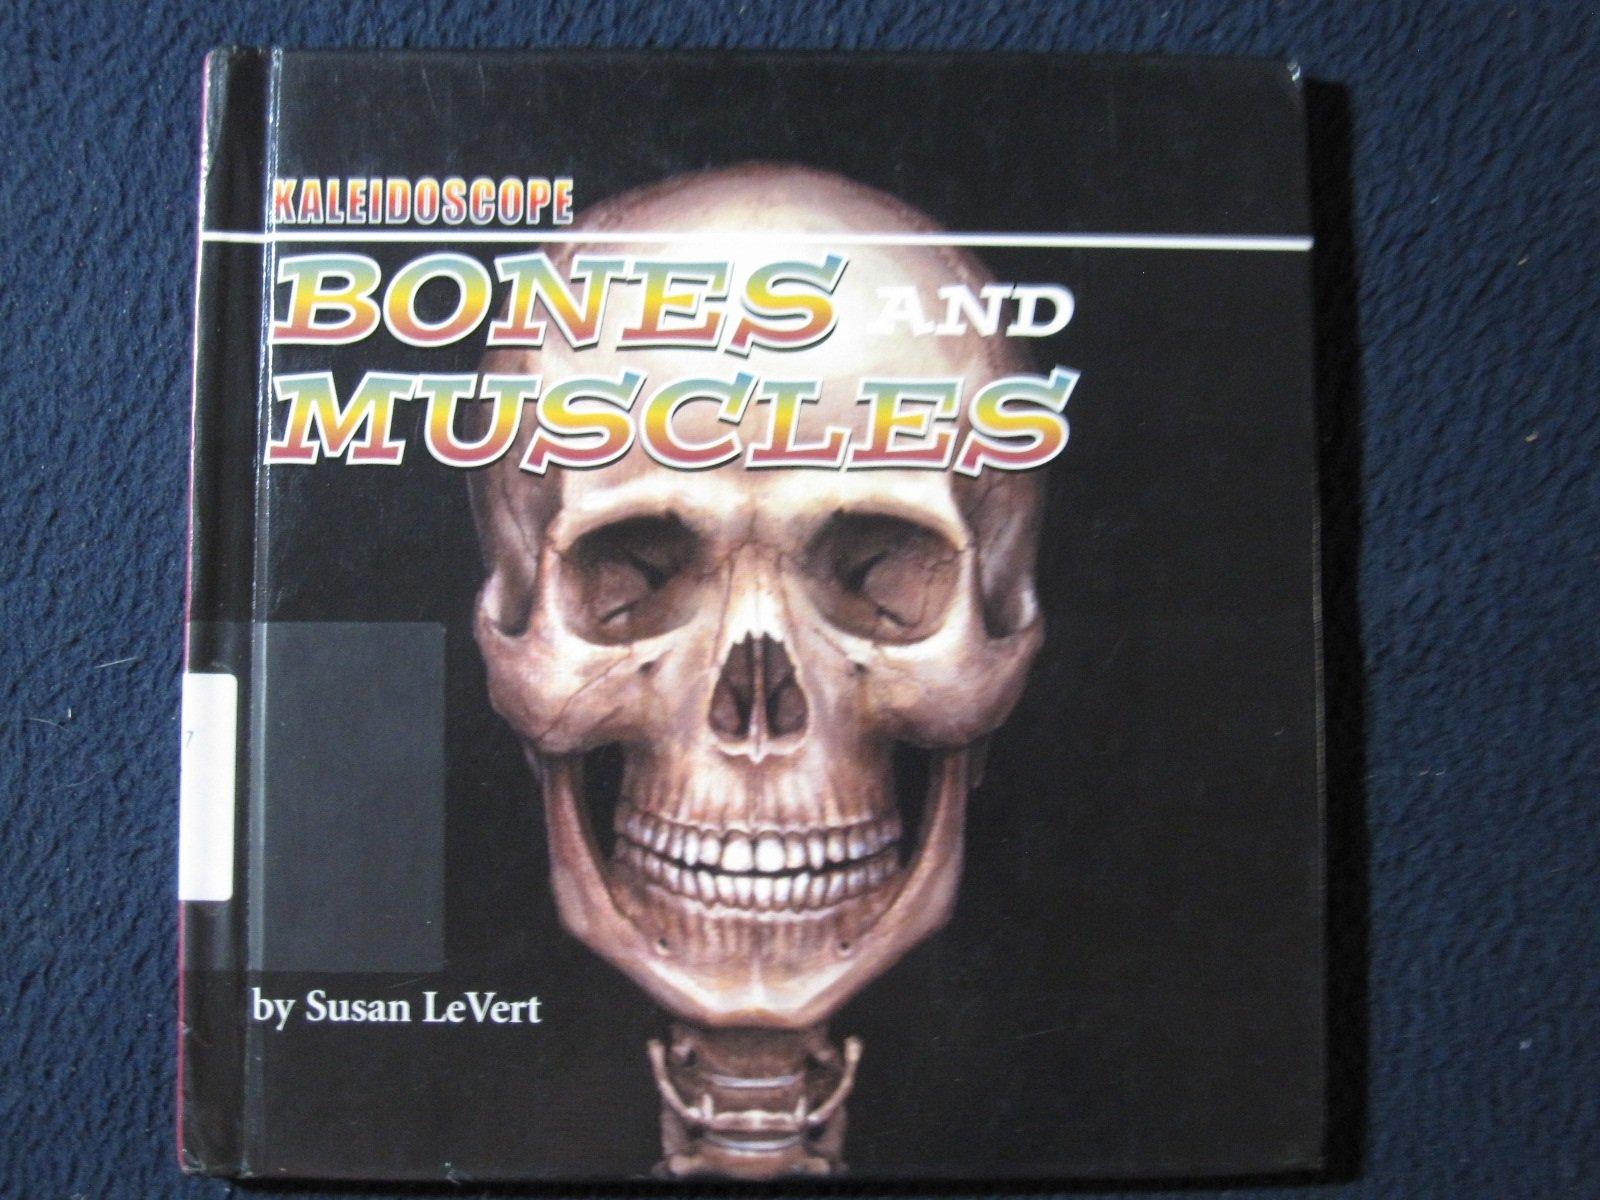 Bones and Muscles (Kaleidoscope)